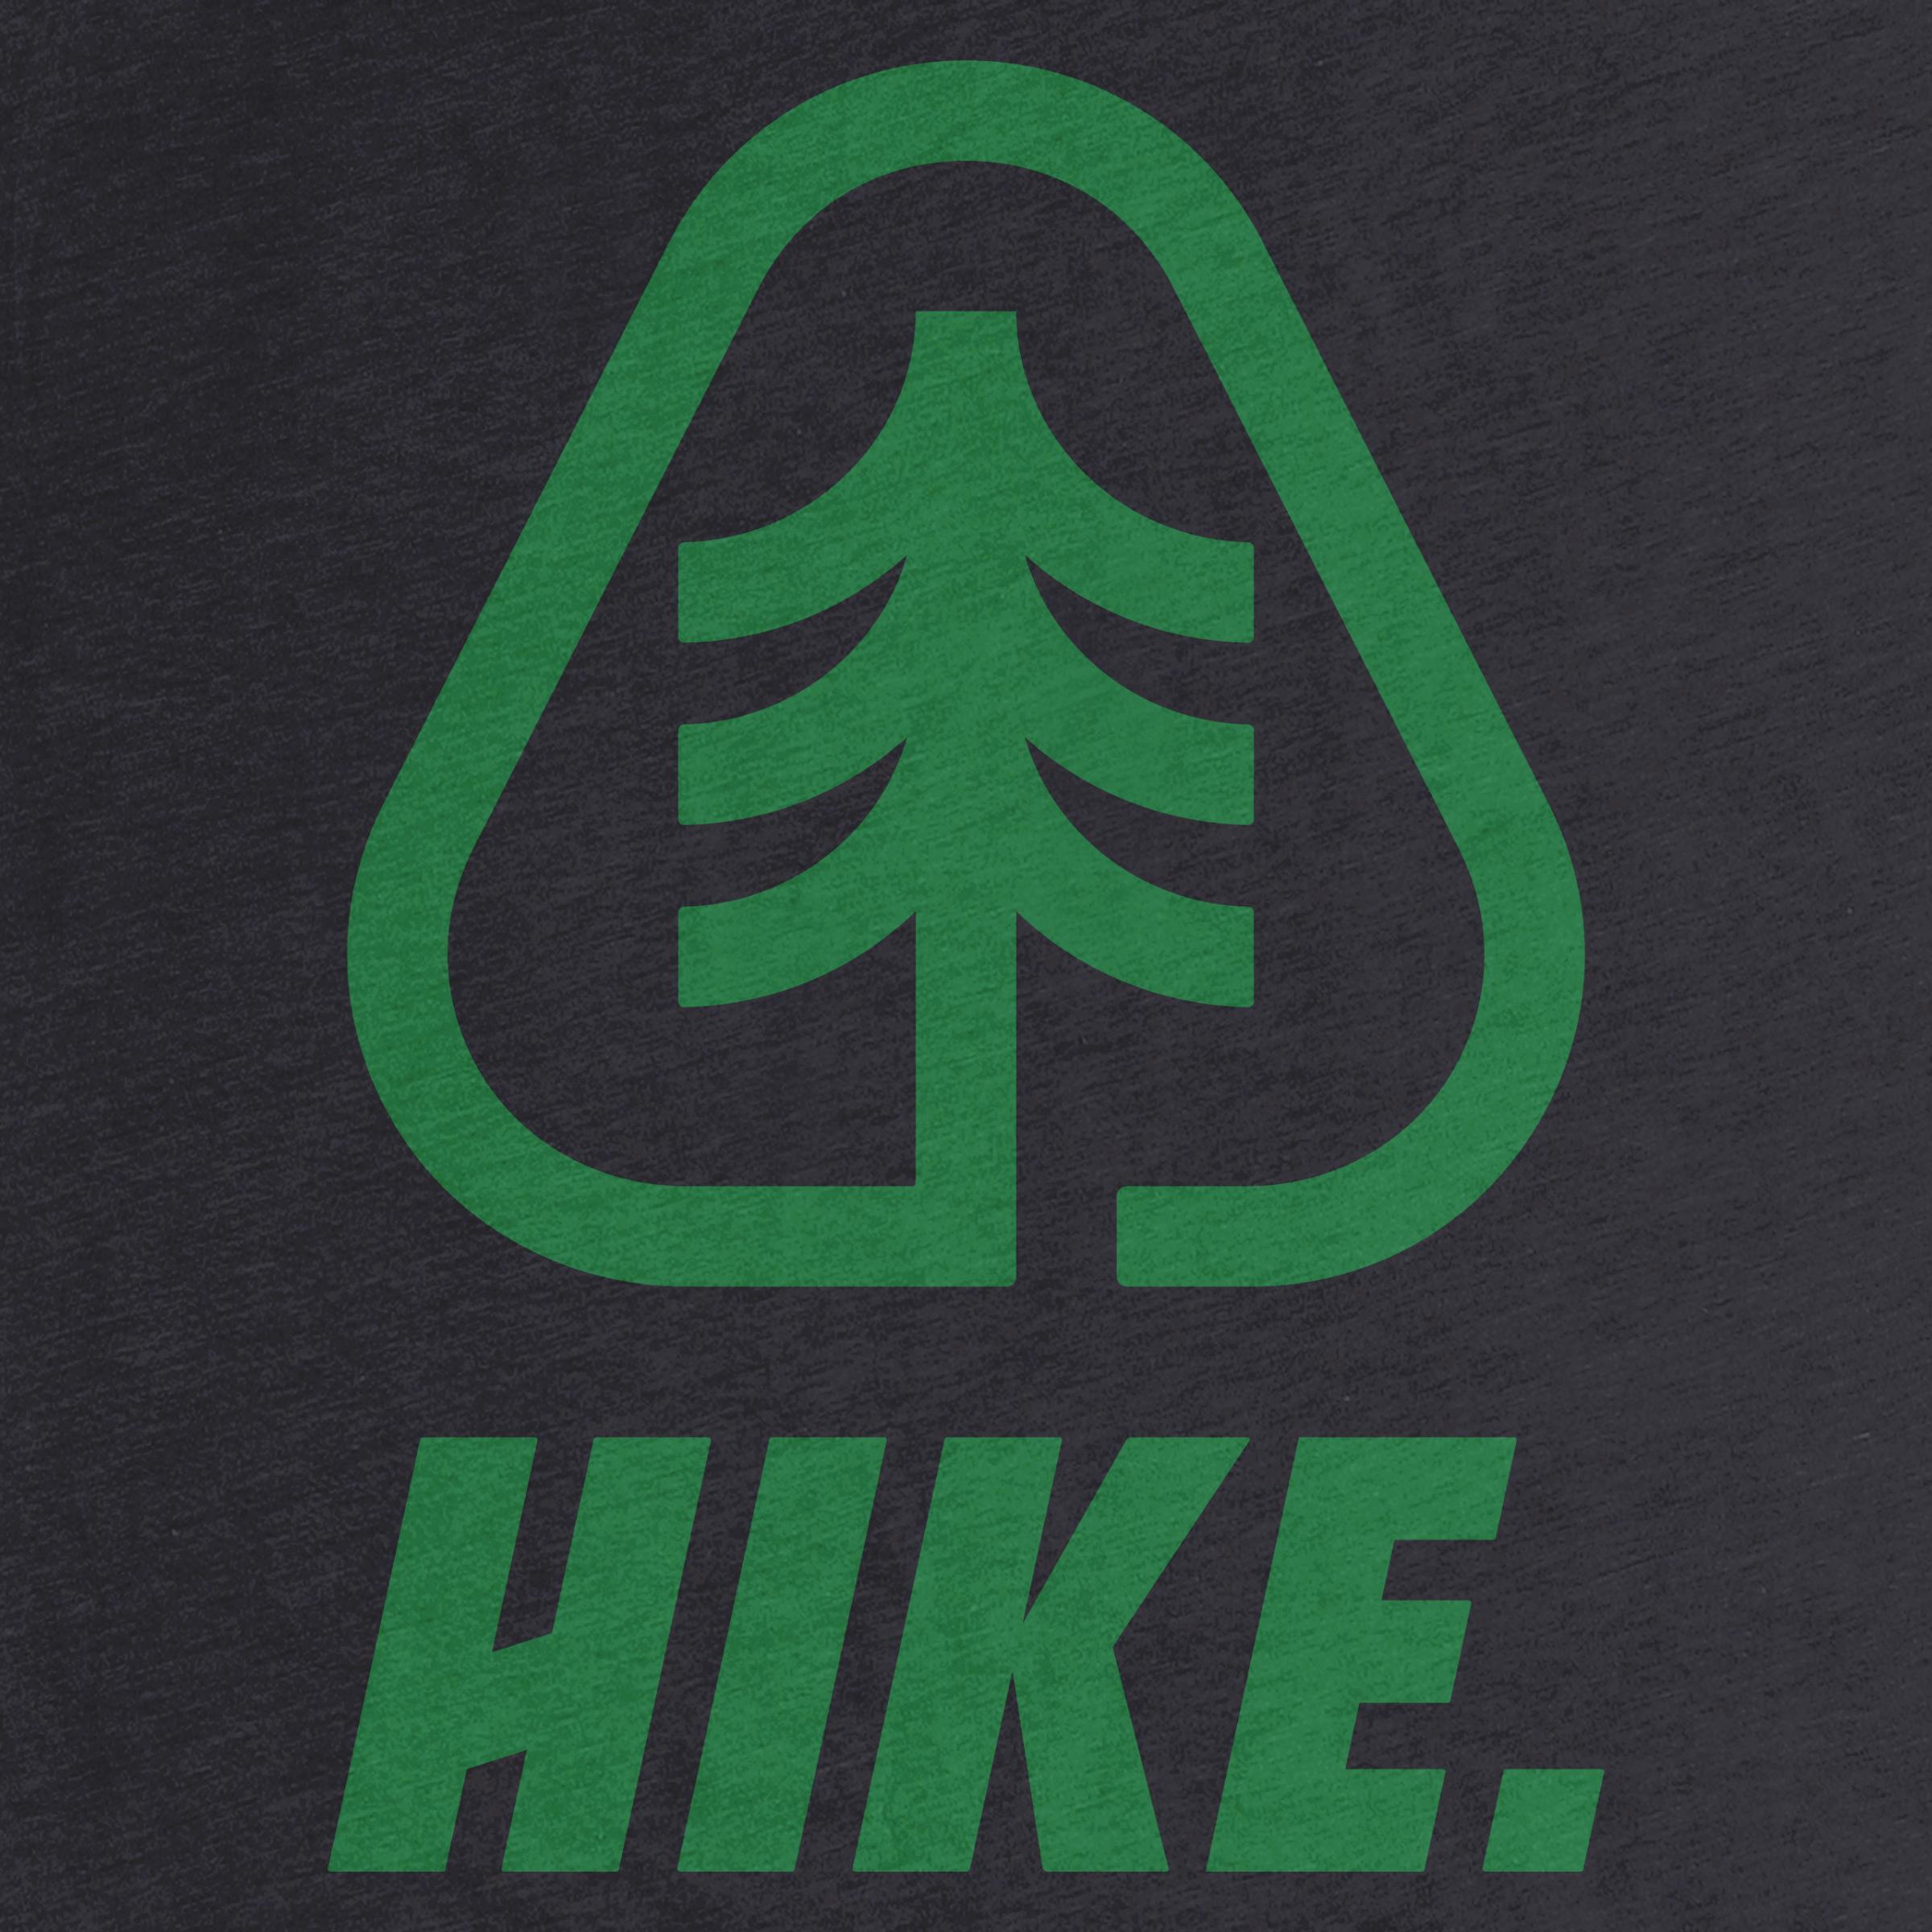 Hike.